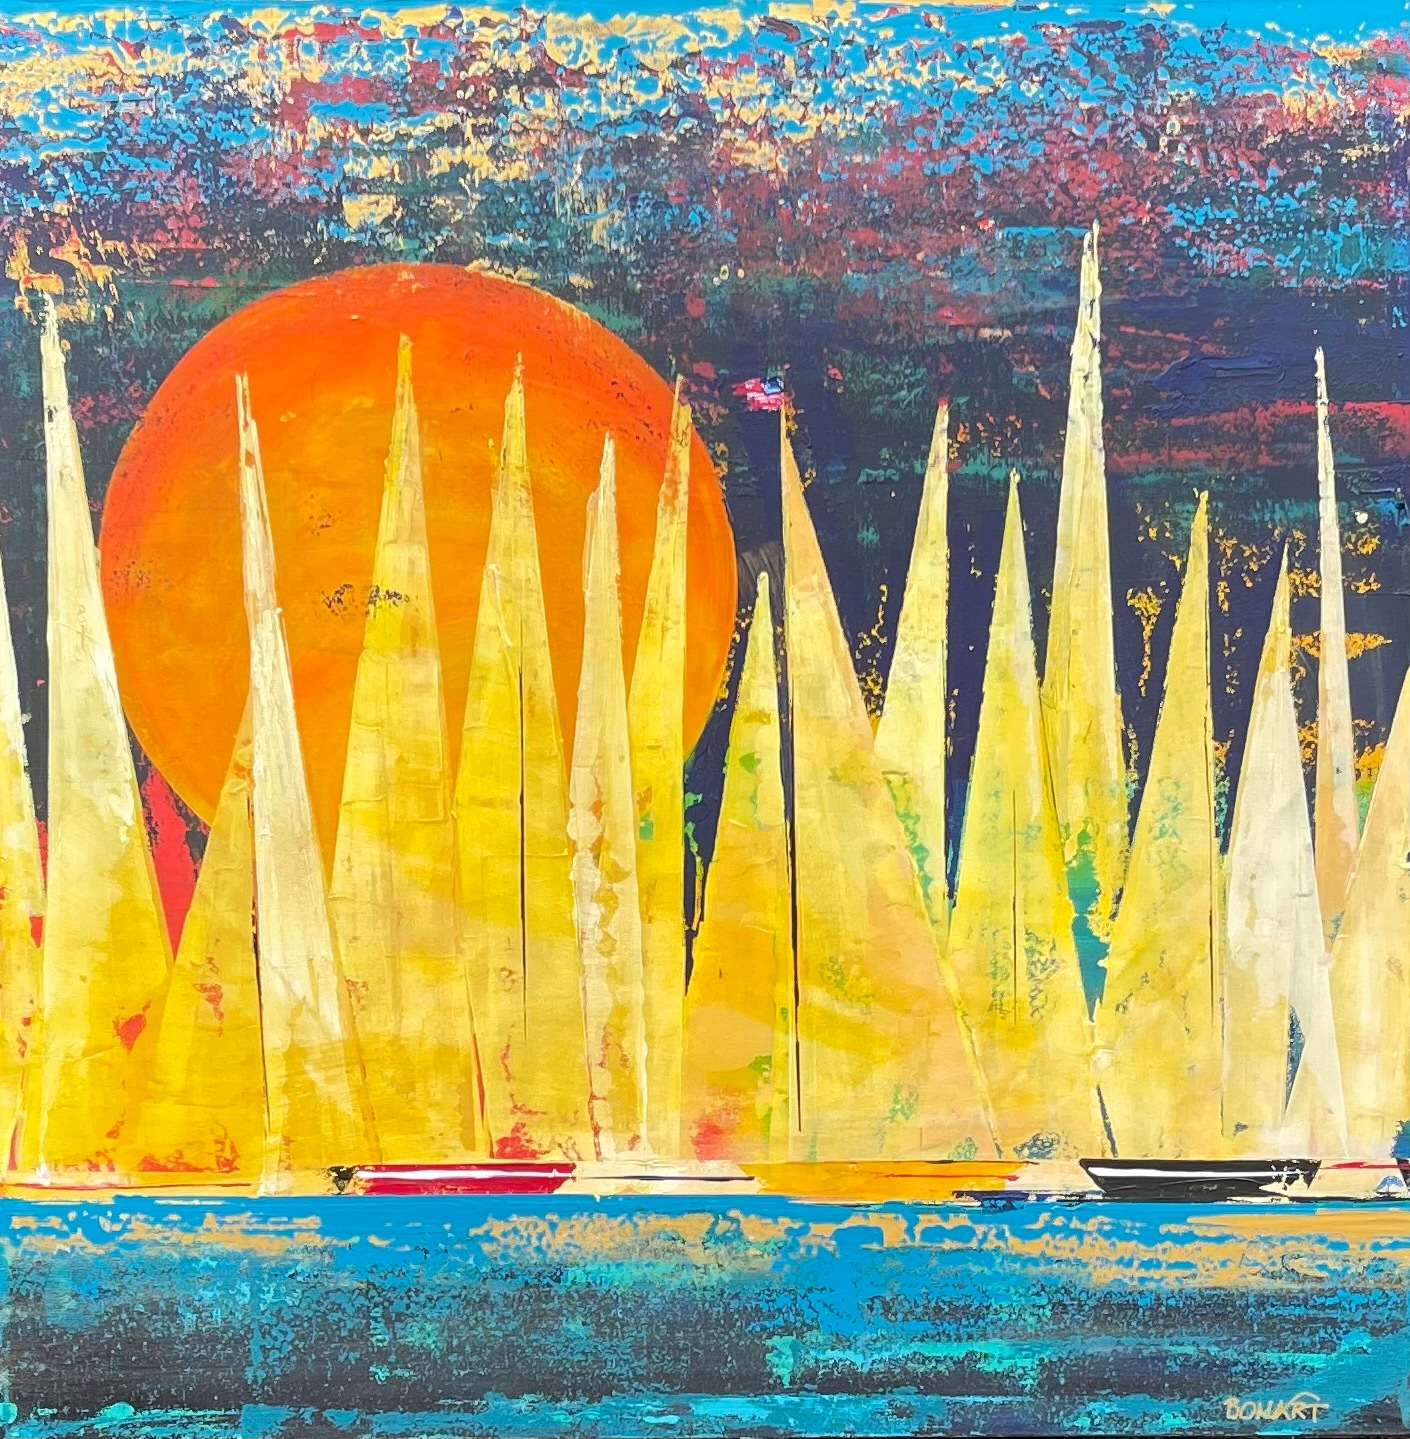 Evening sail lm56tf